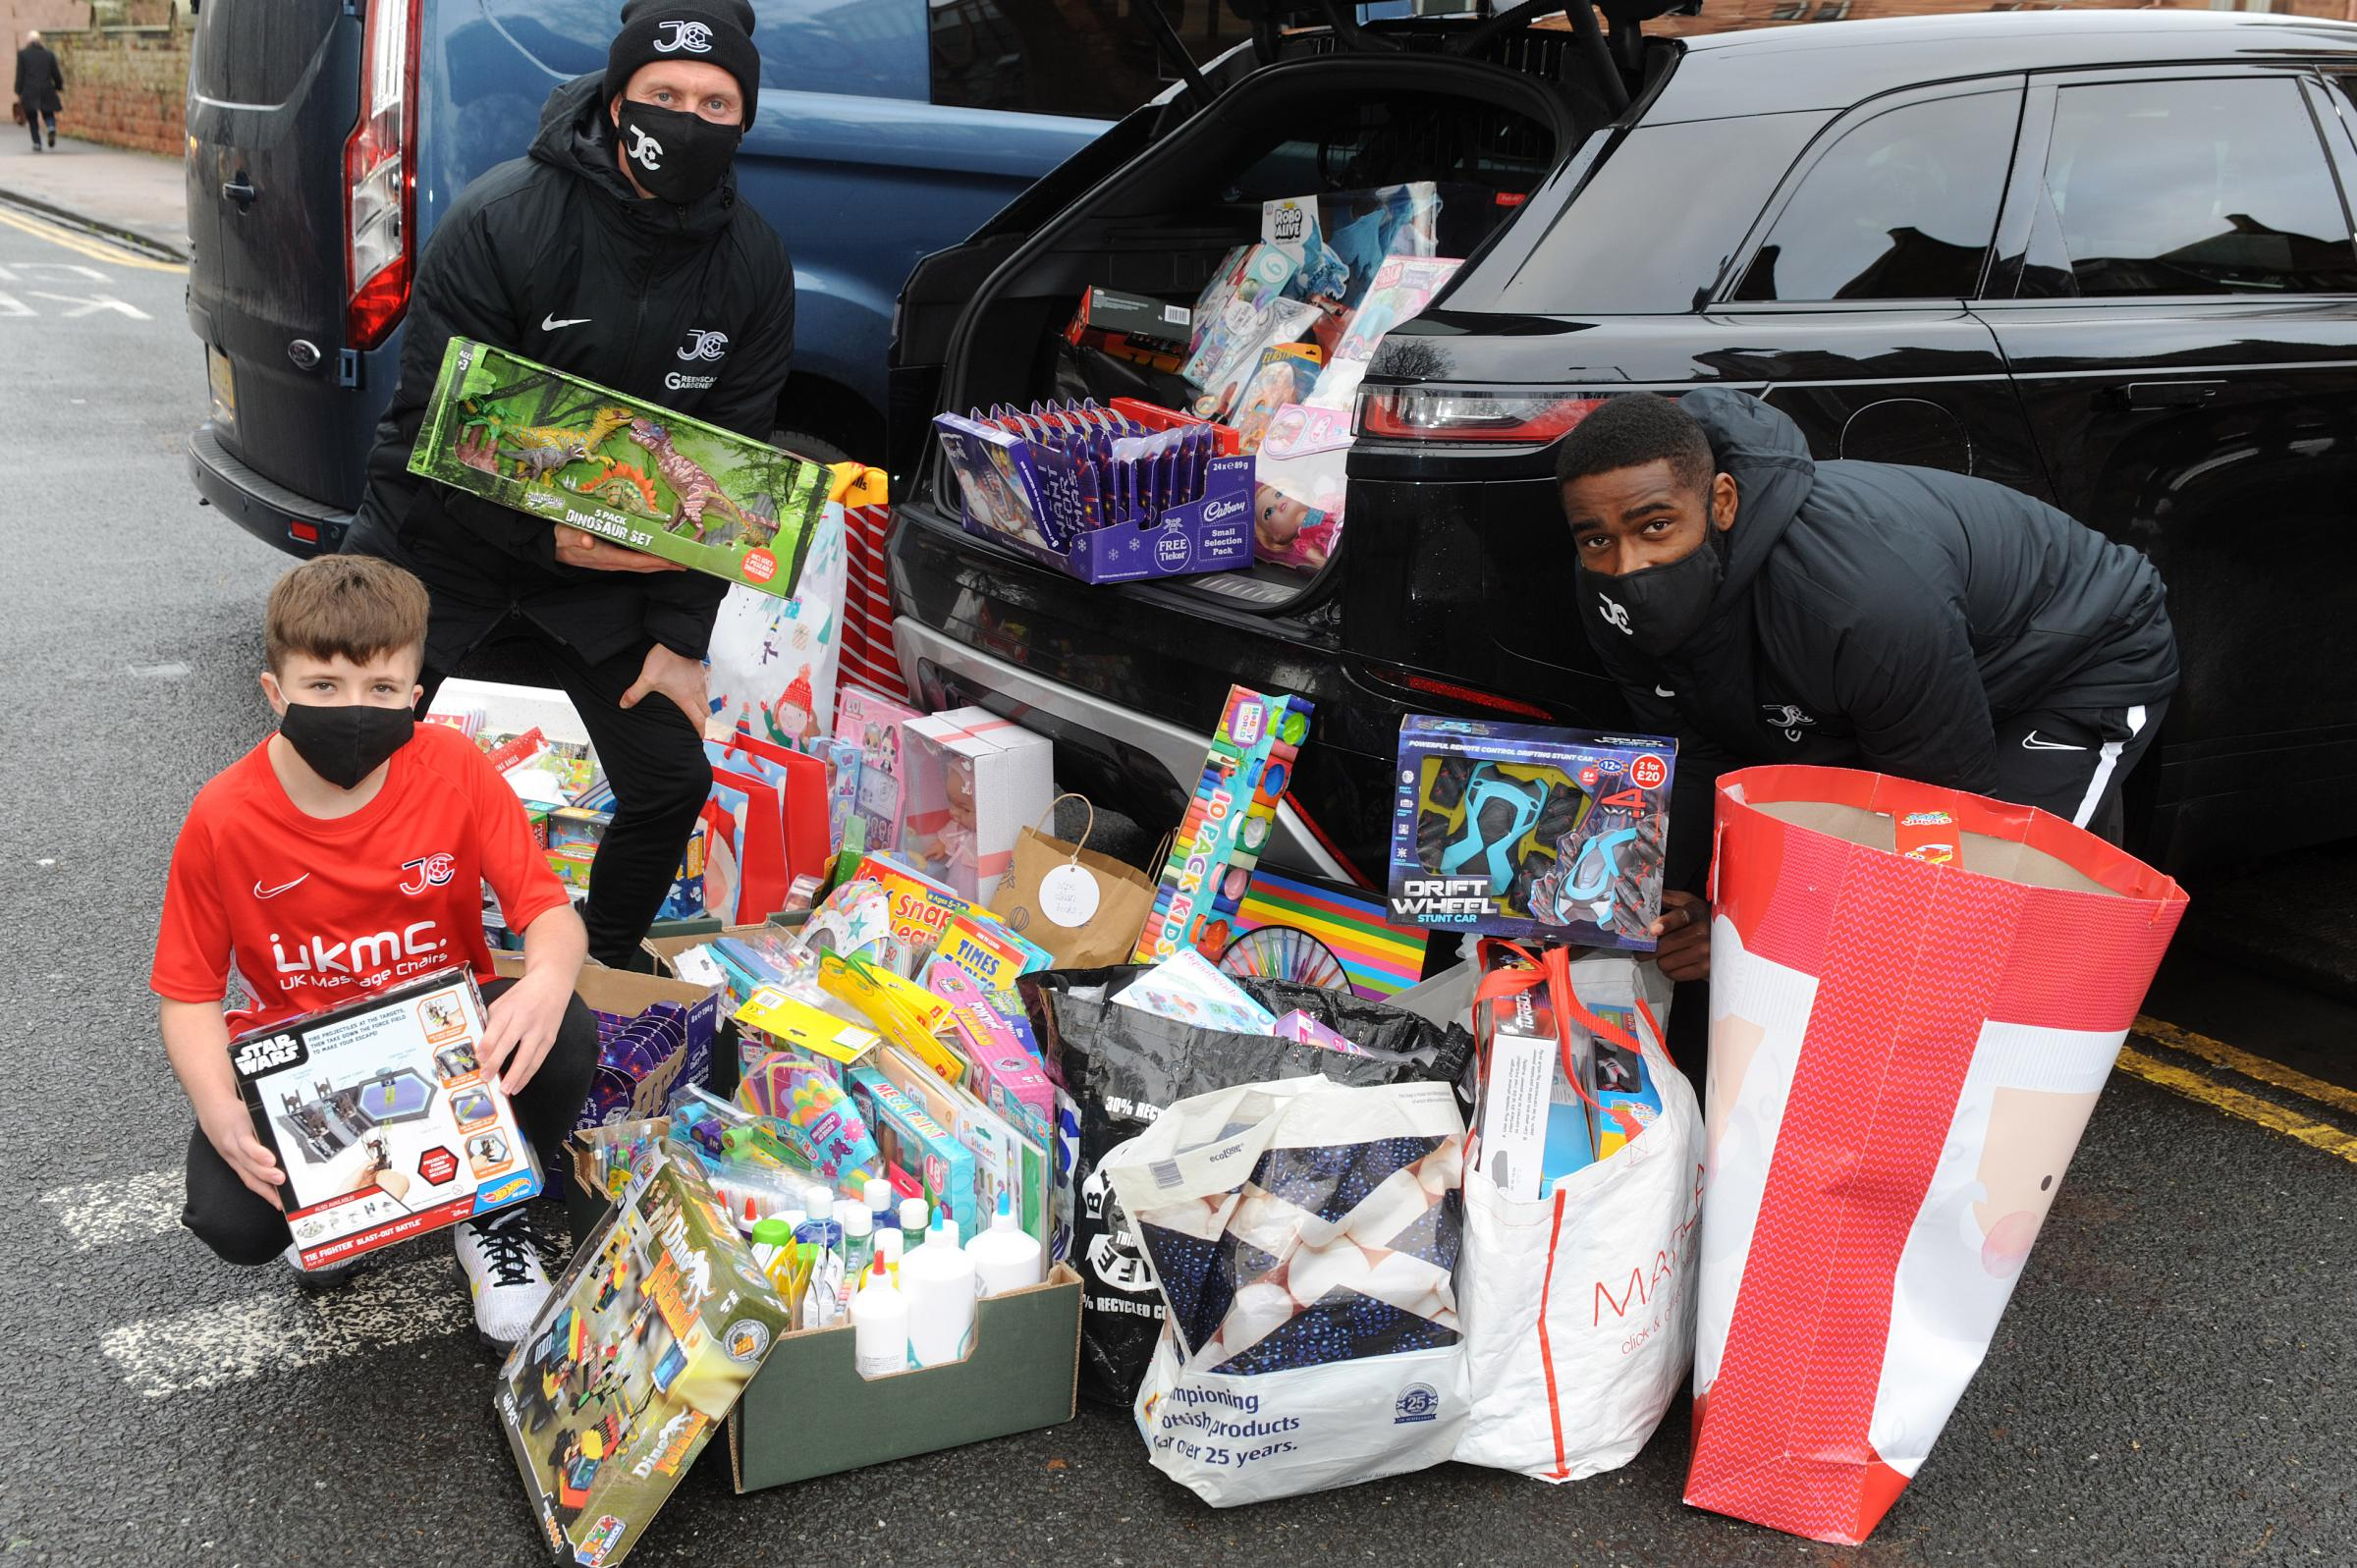 Ho Ho Joe! Jags winger Cardle delivers Christmas presents to sick kids